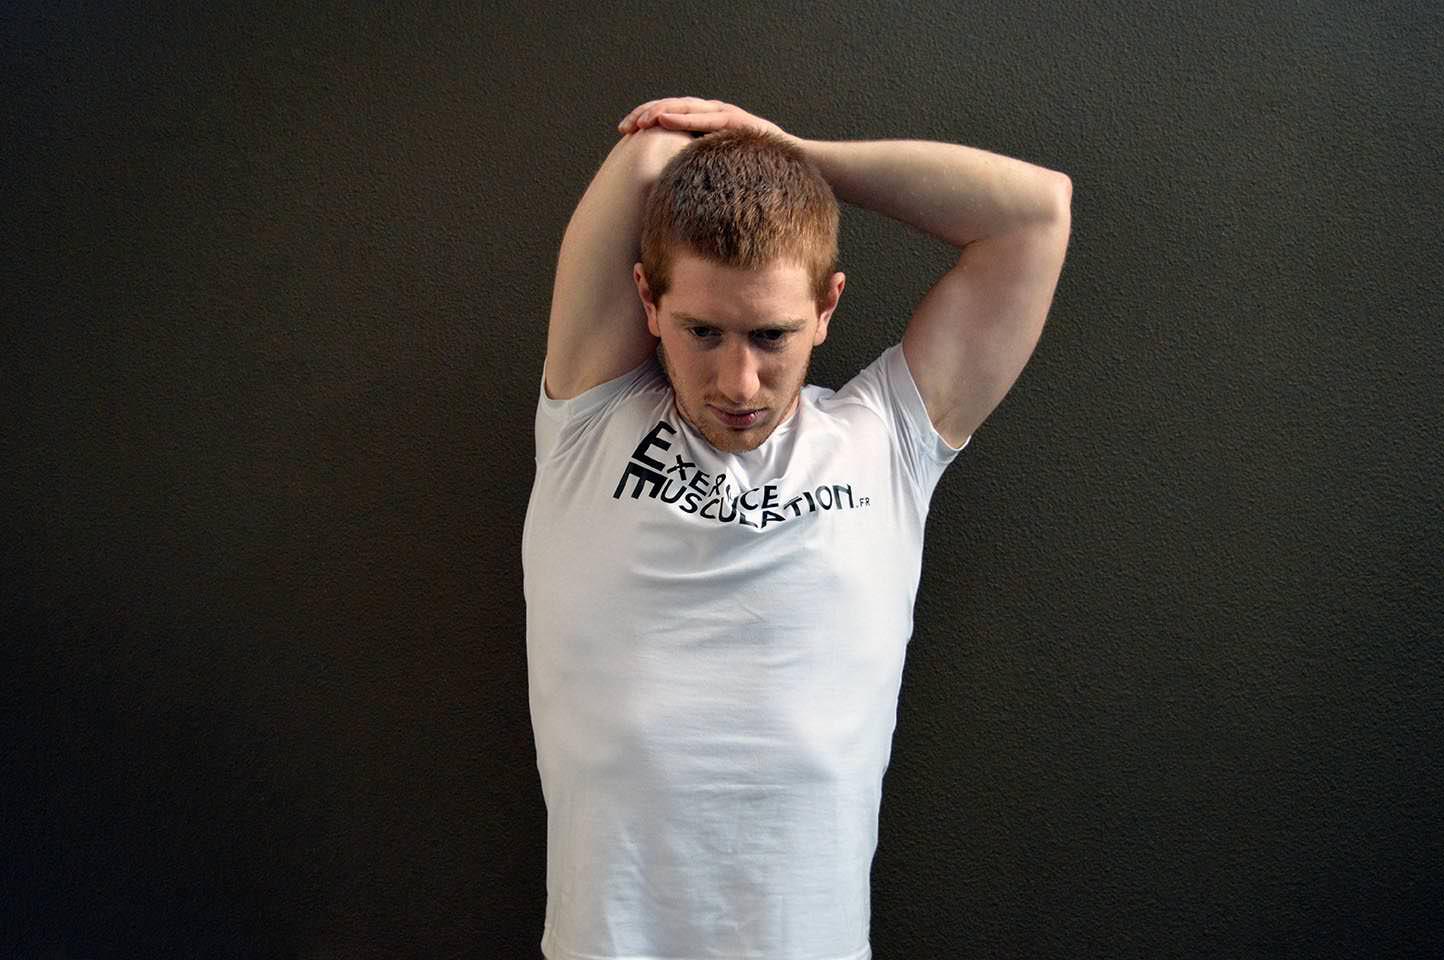 Étirement triceps - Position 1